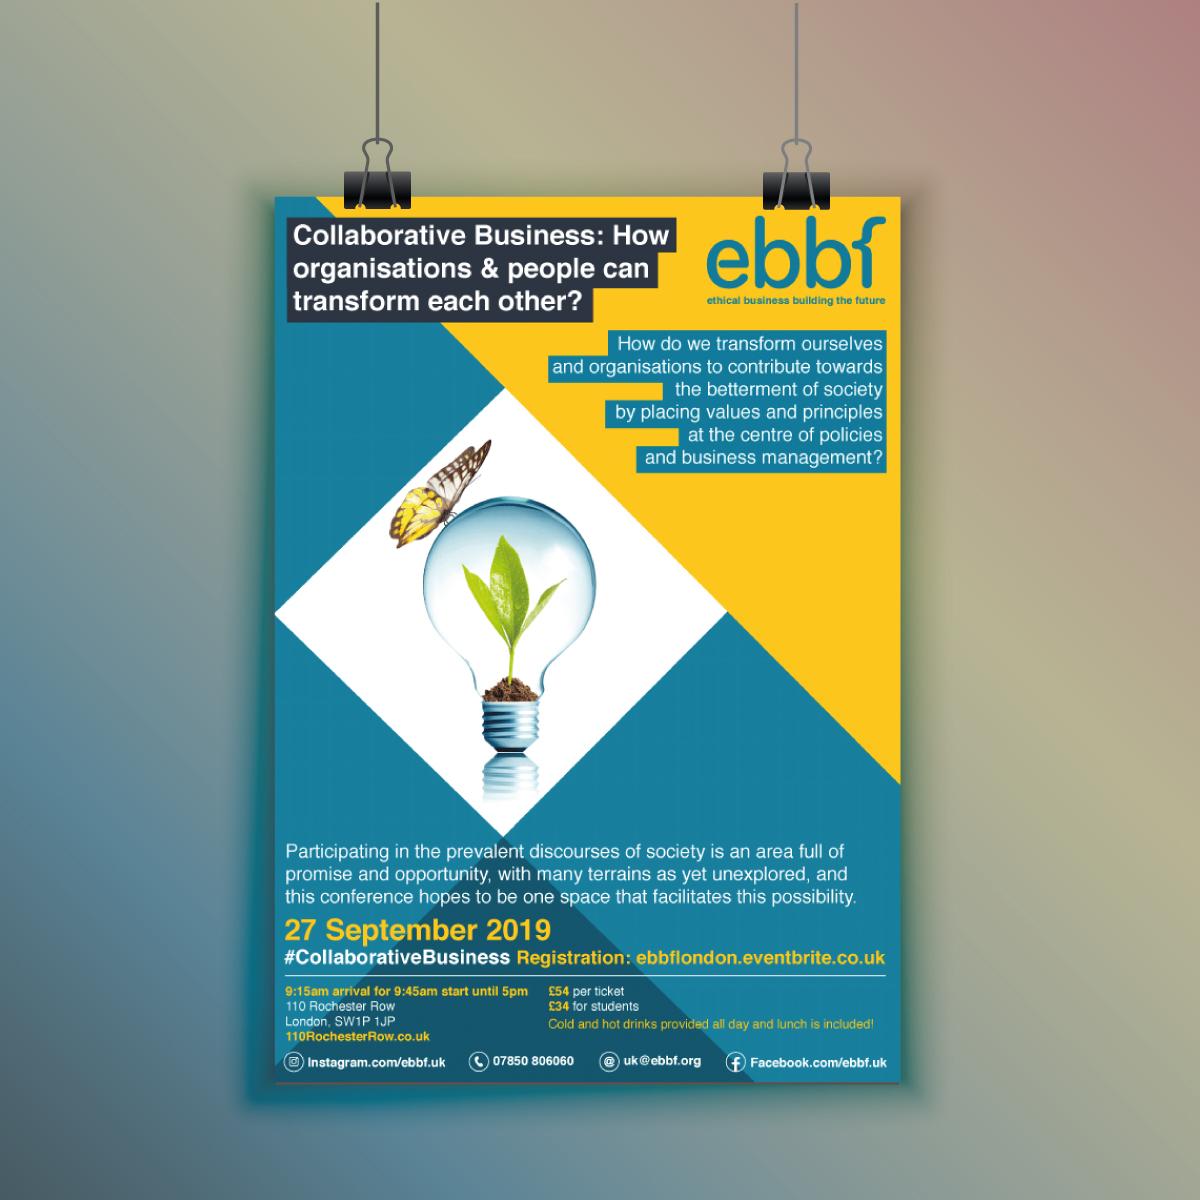 Ebbf poster design by Viviane Williams Consultancy